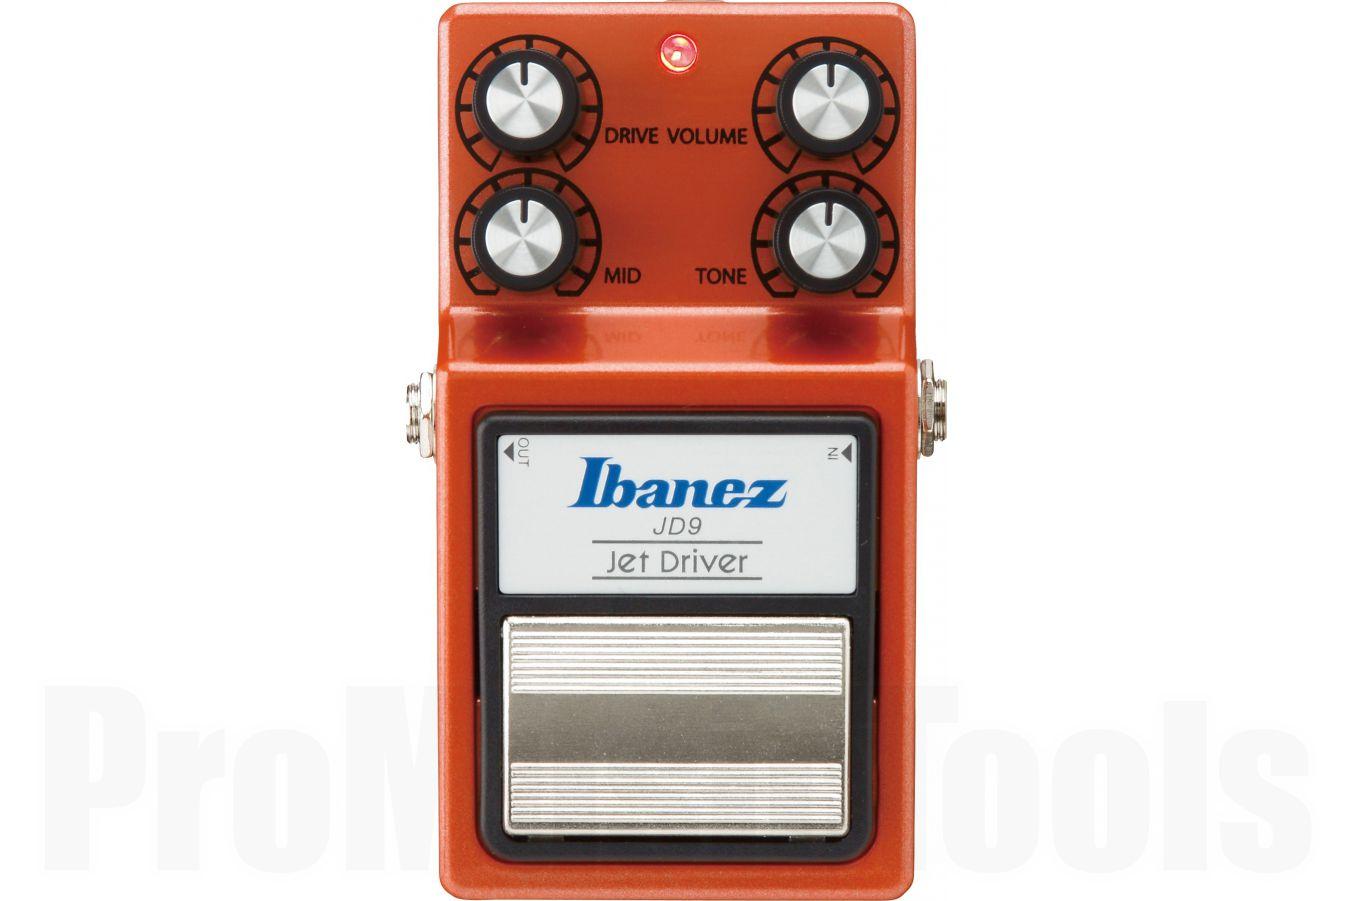 Ibanez JD9 Jet Driver - demo